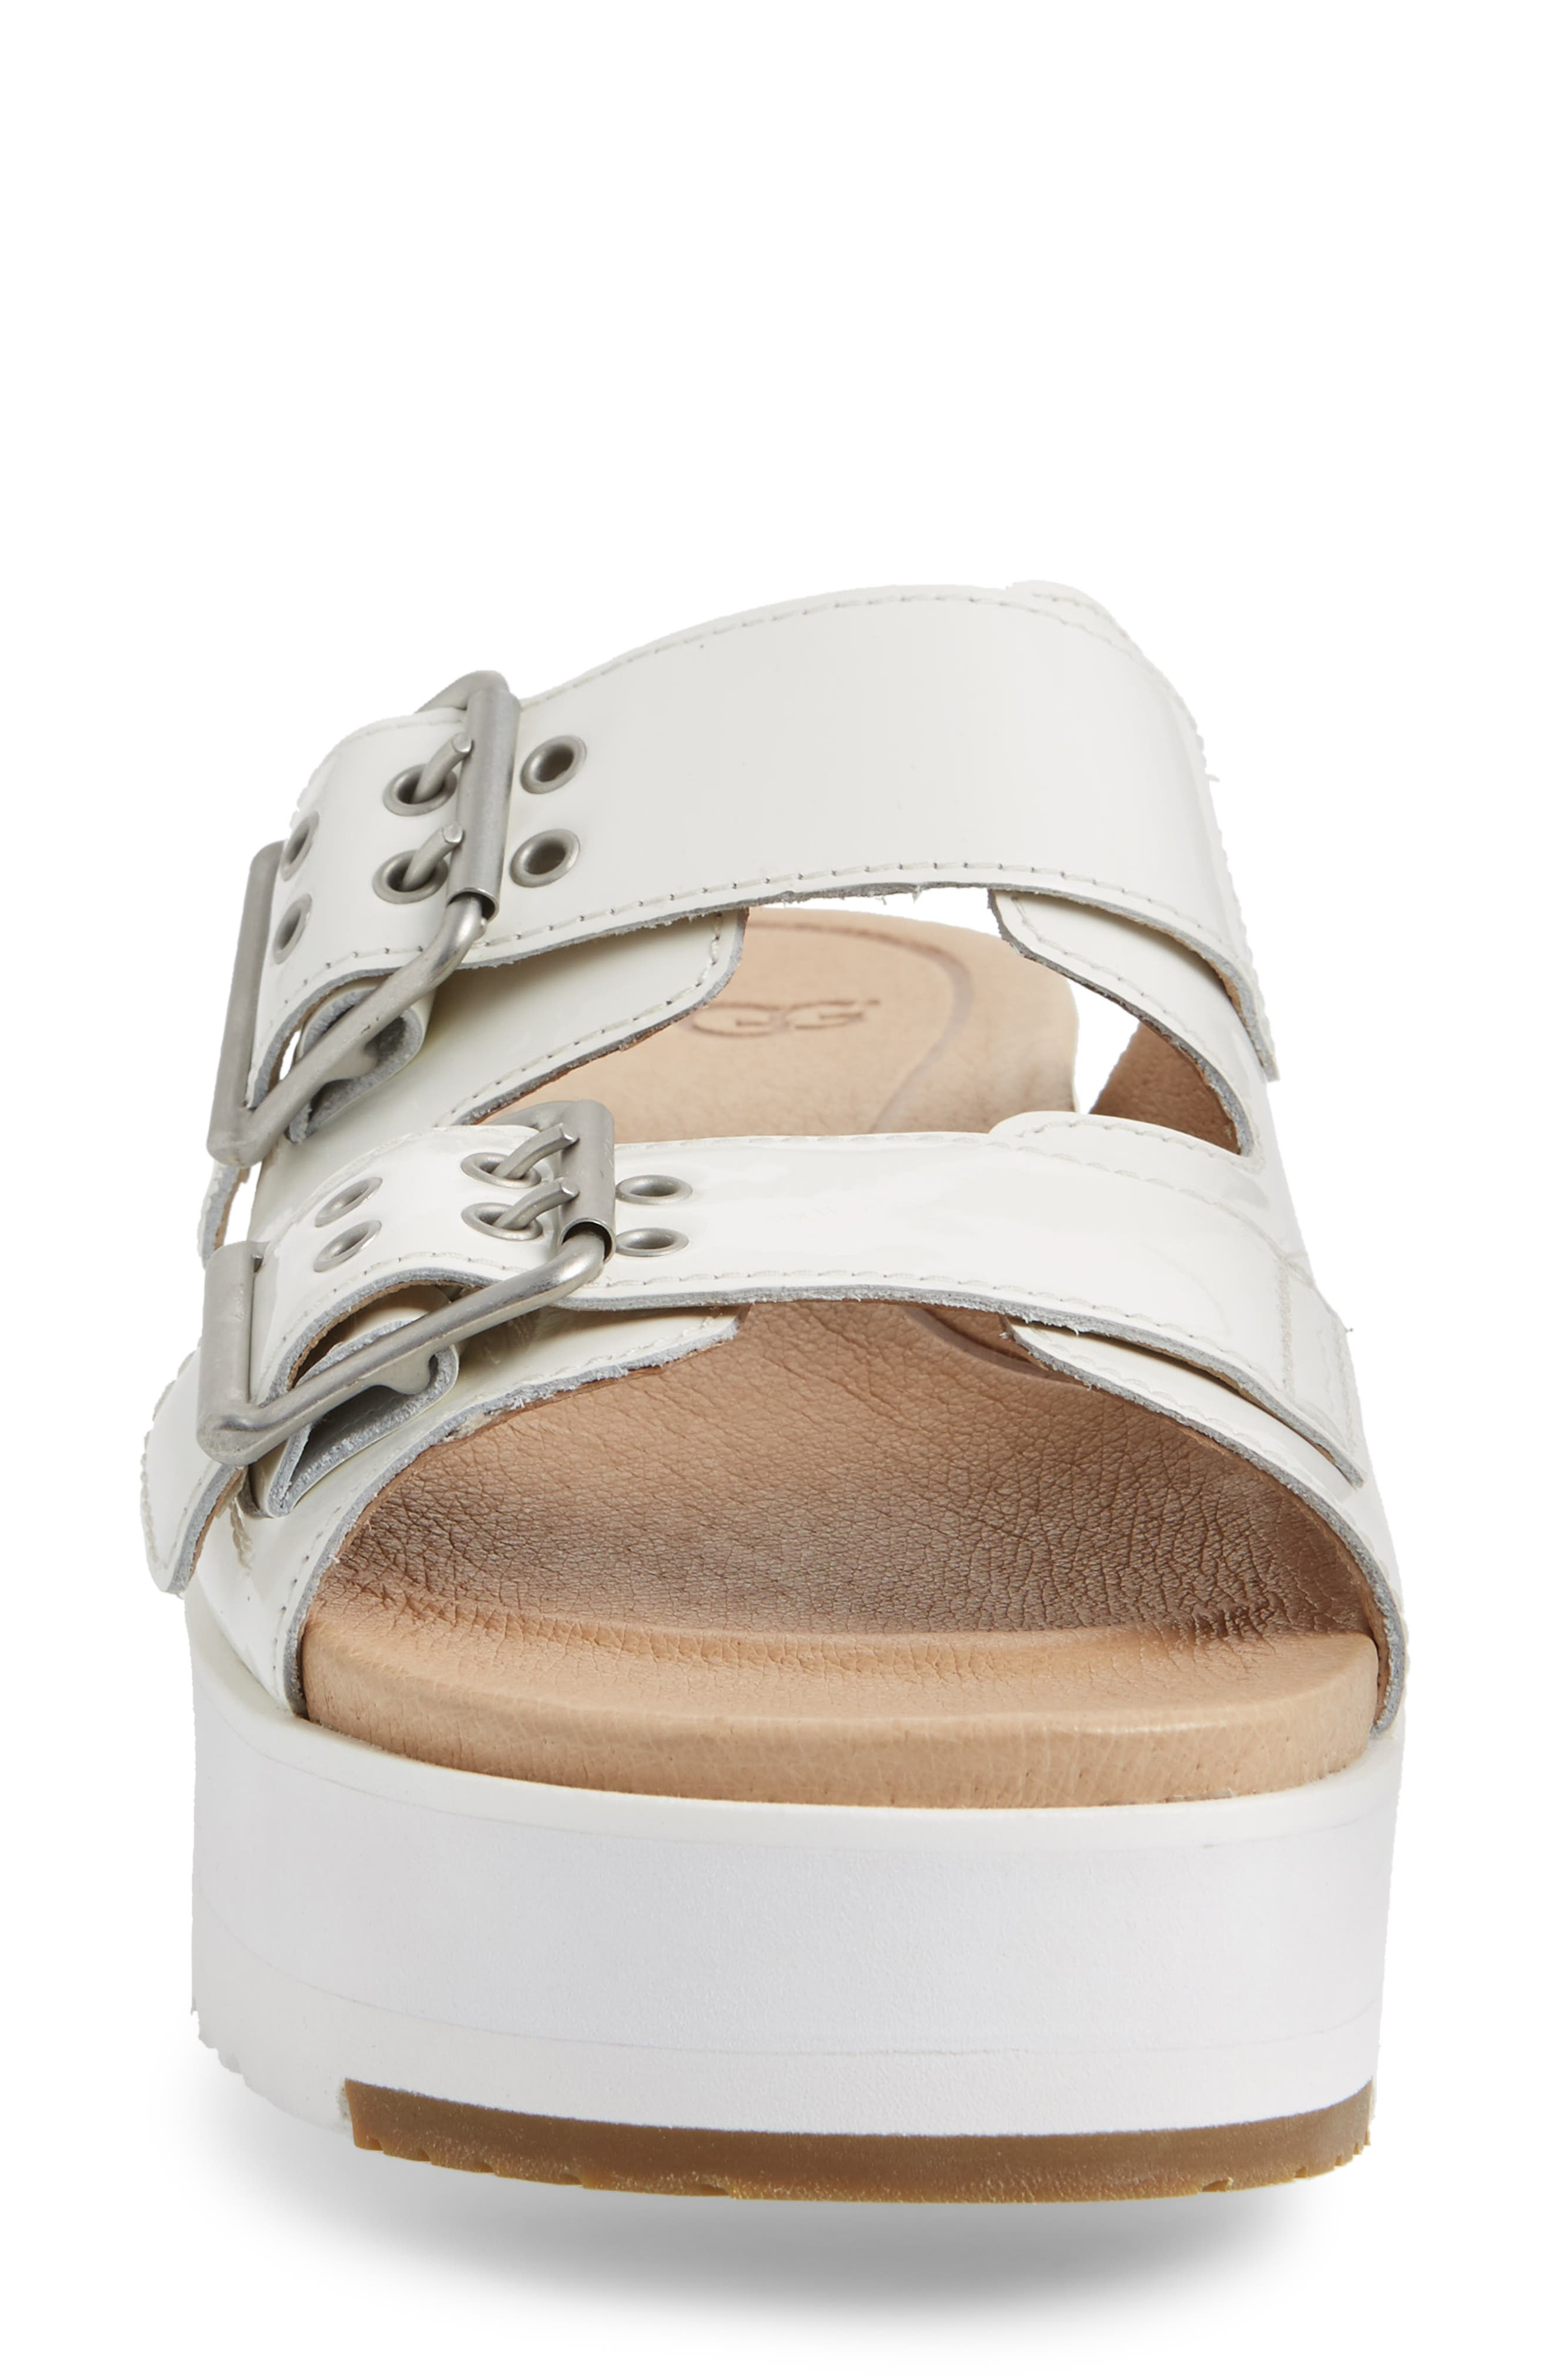 Cammie Platform Slide Sandal,                             Alternate thumbnail 8, color,